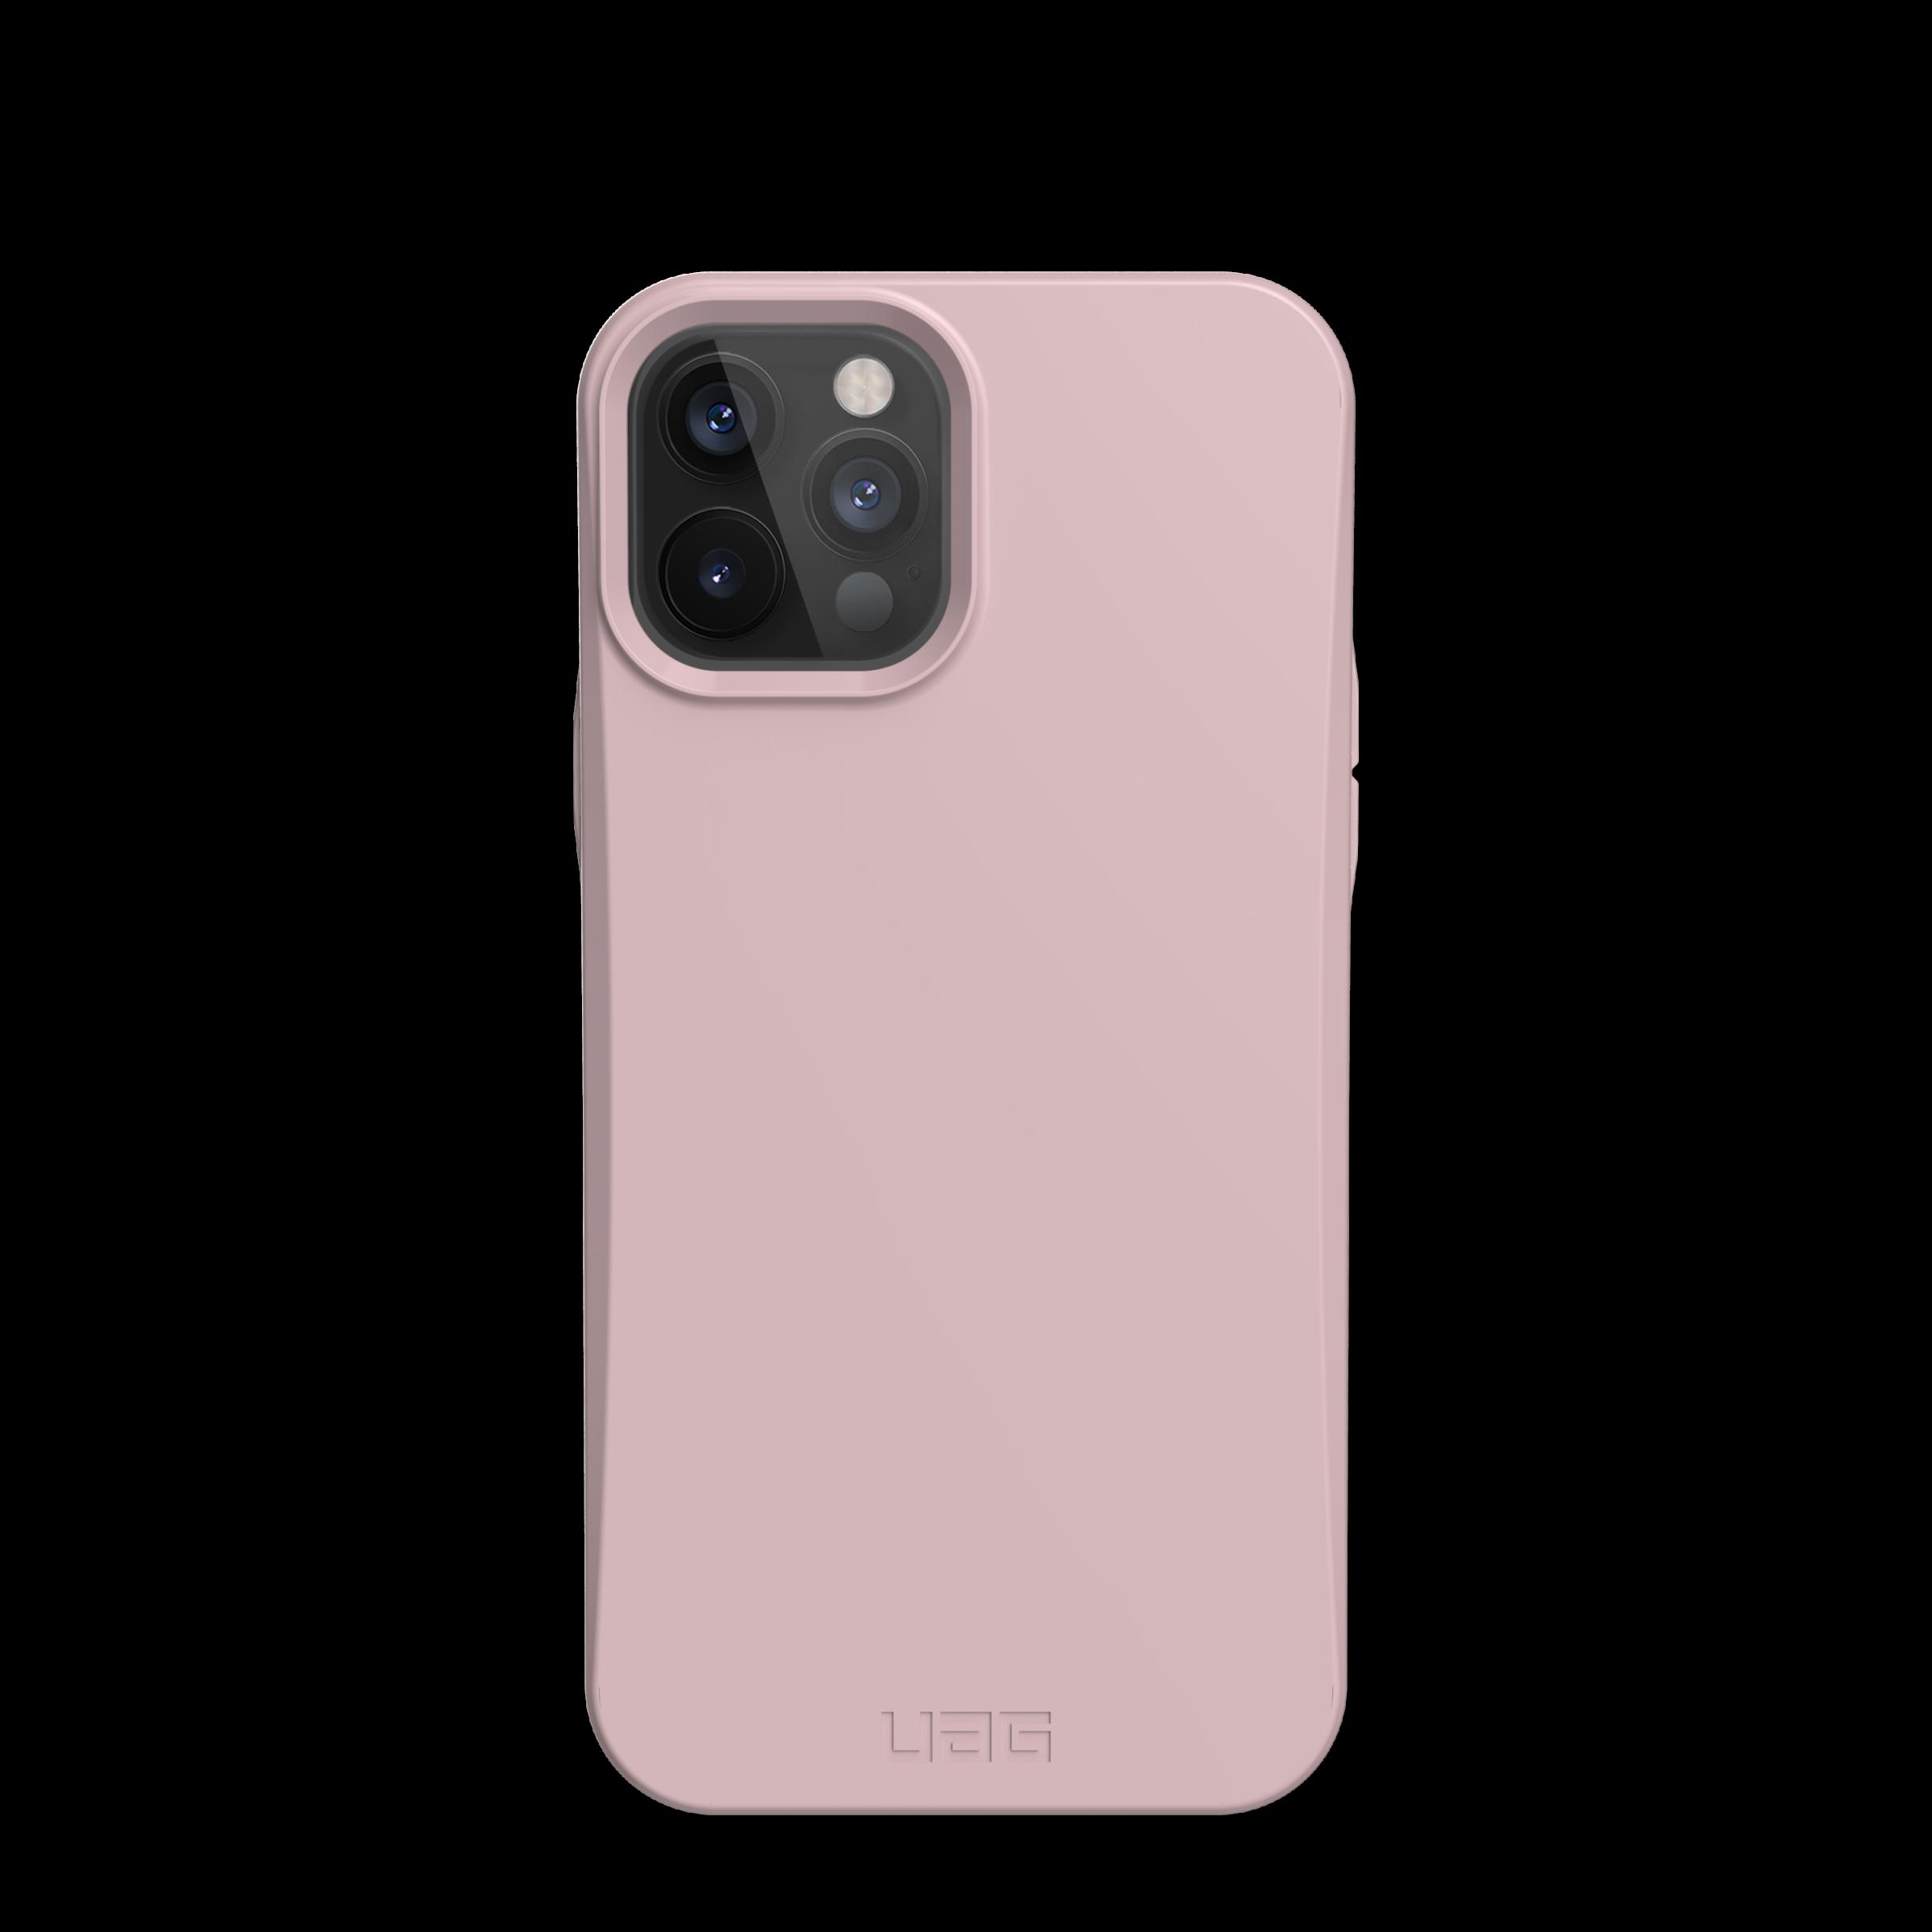 Outback Bio Case iPhone 12 Pro Max Lilac